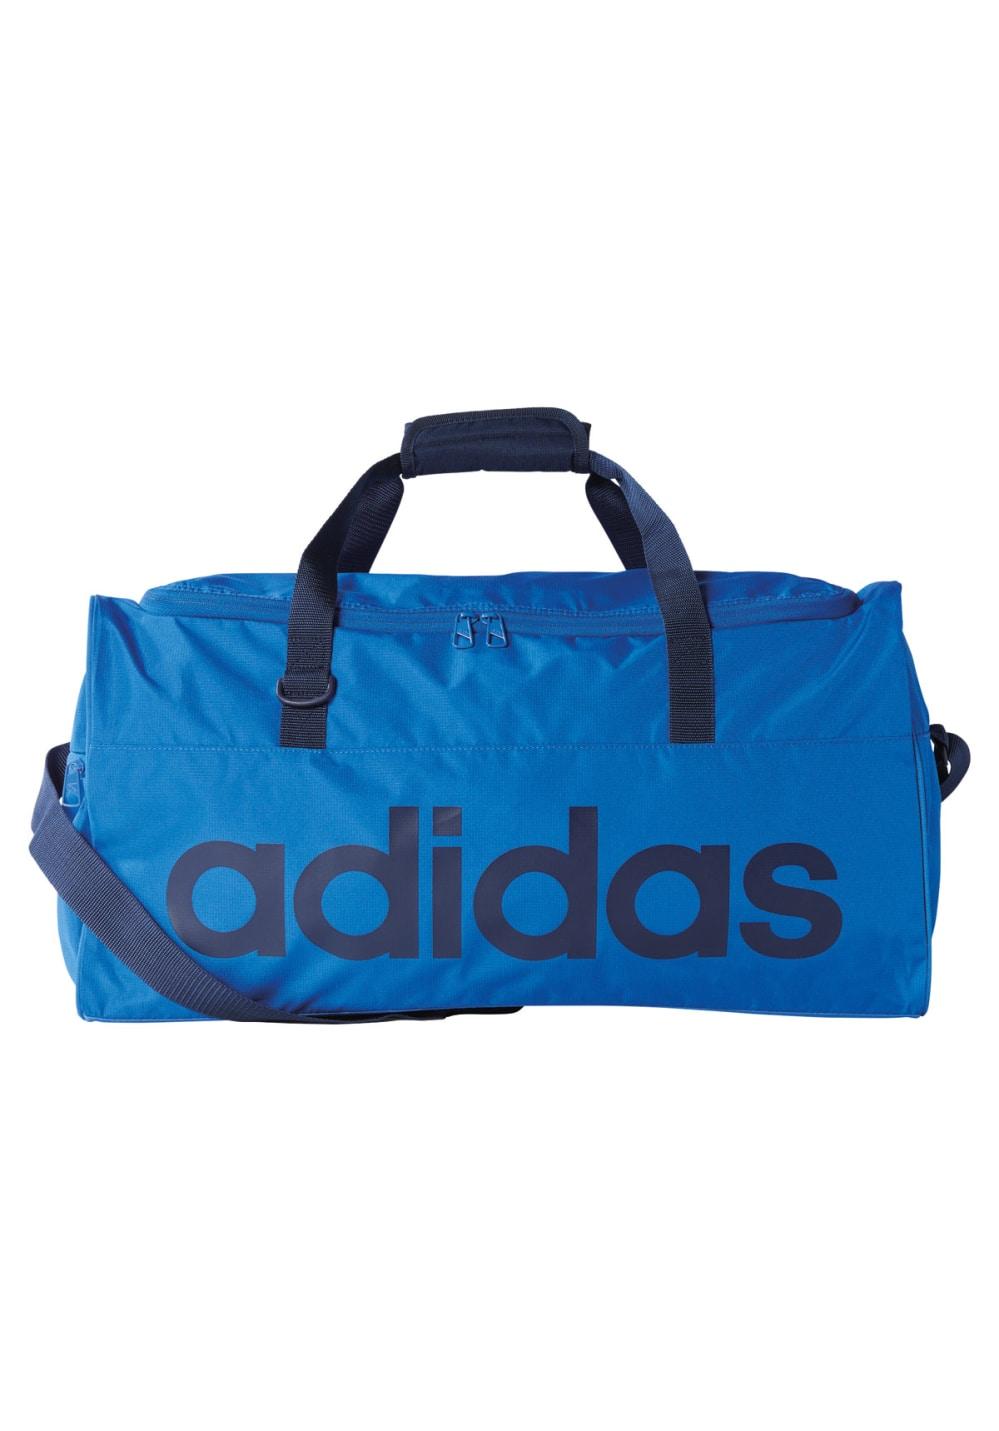 c86c25468 adidas Linear Performance Teambag M - Bolsas de deporte - Azul   21RUN